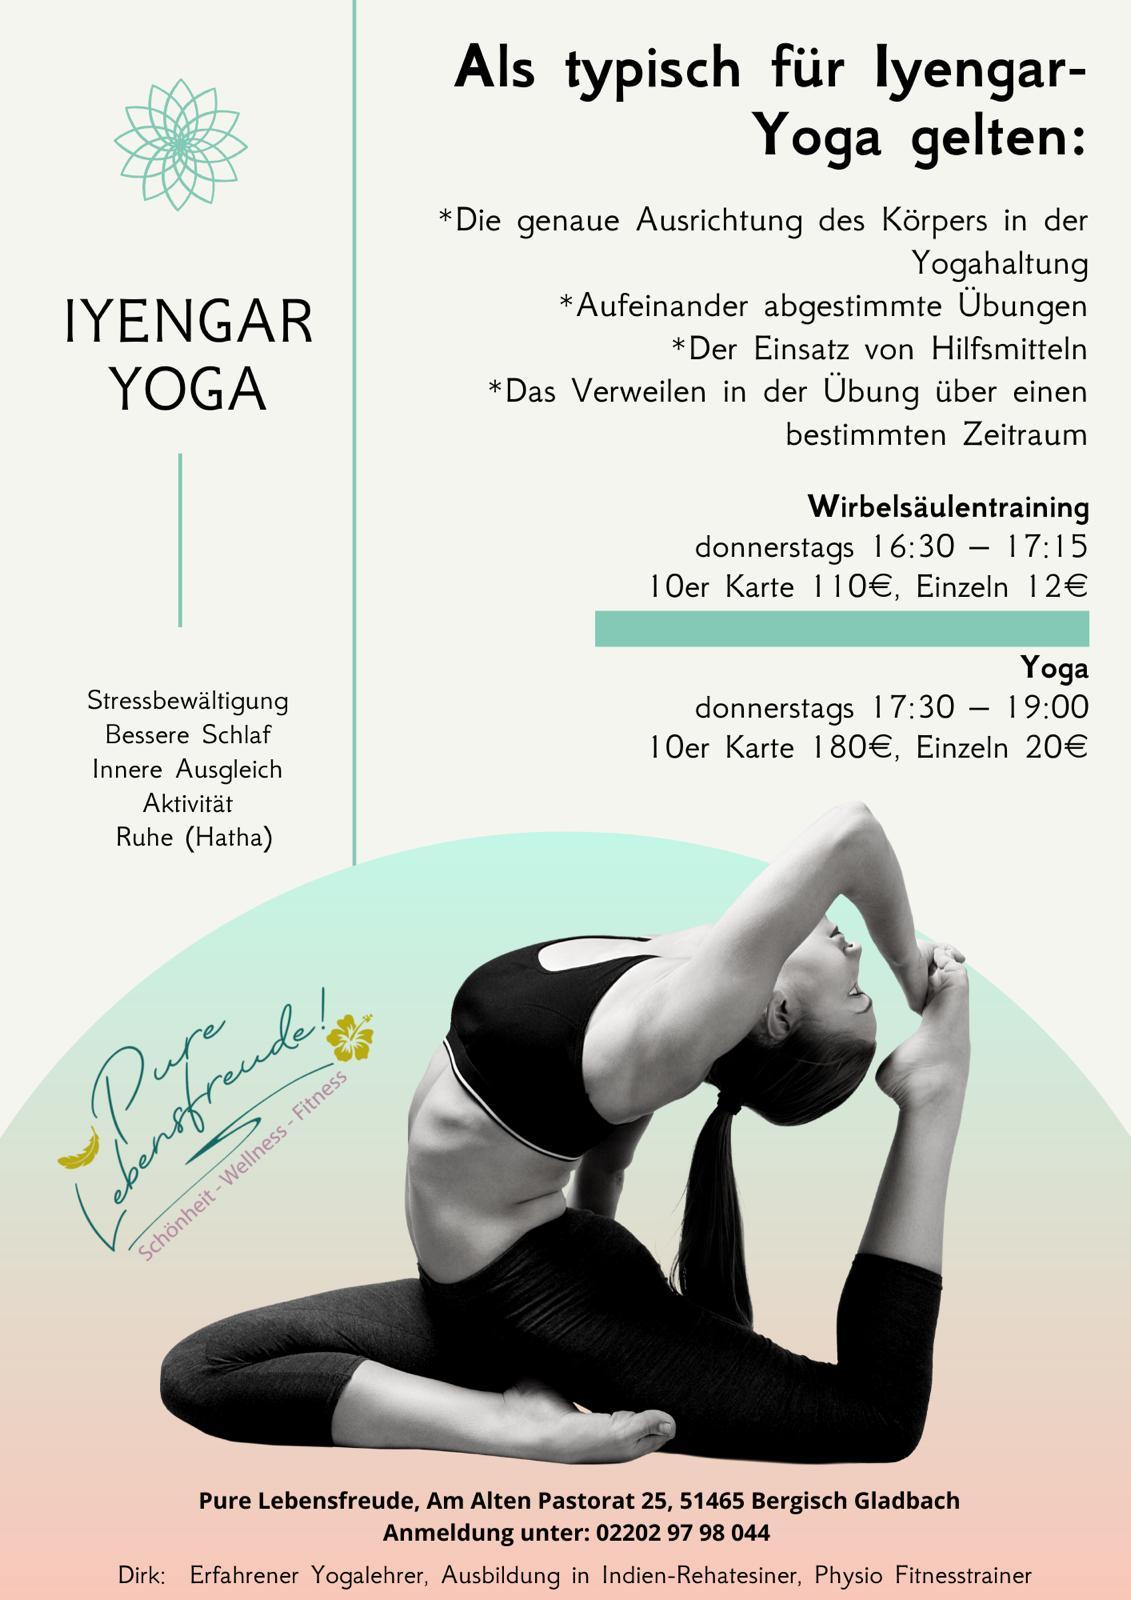 Flyer Iyengar-Yoga Wirbelsäulentraining